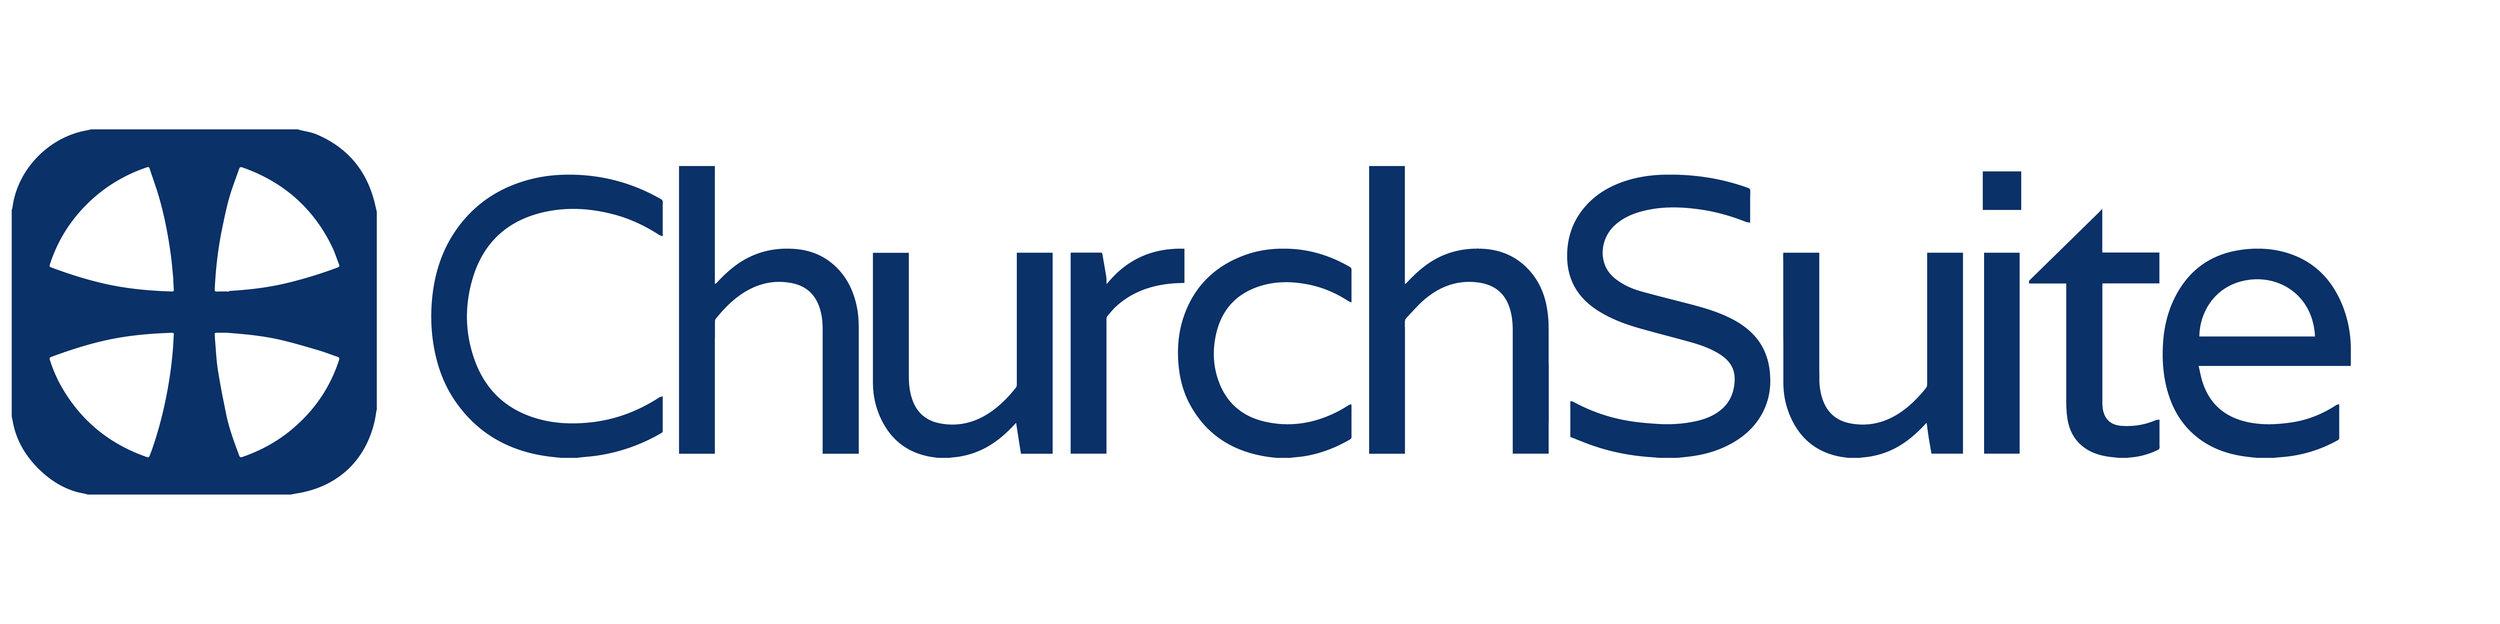 logo-blue-01.jpg